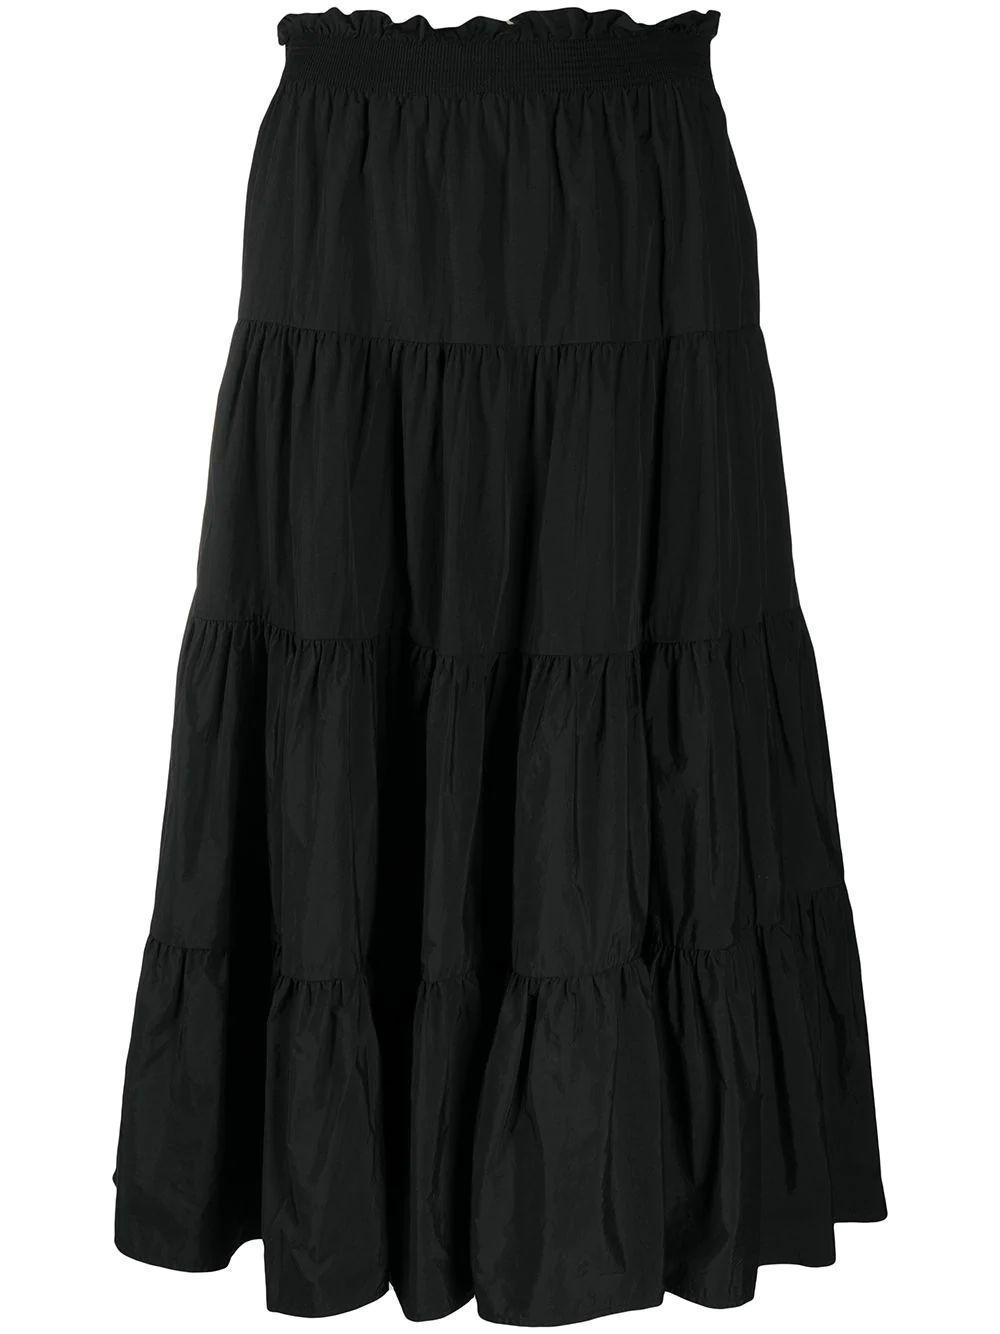 Nadja Tiered Skirt Item # RS21-146